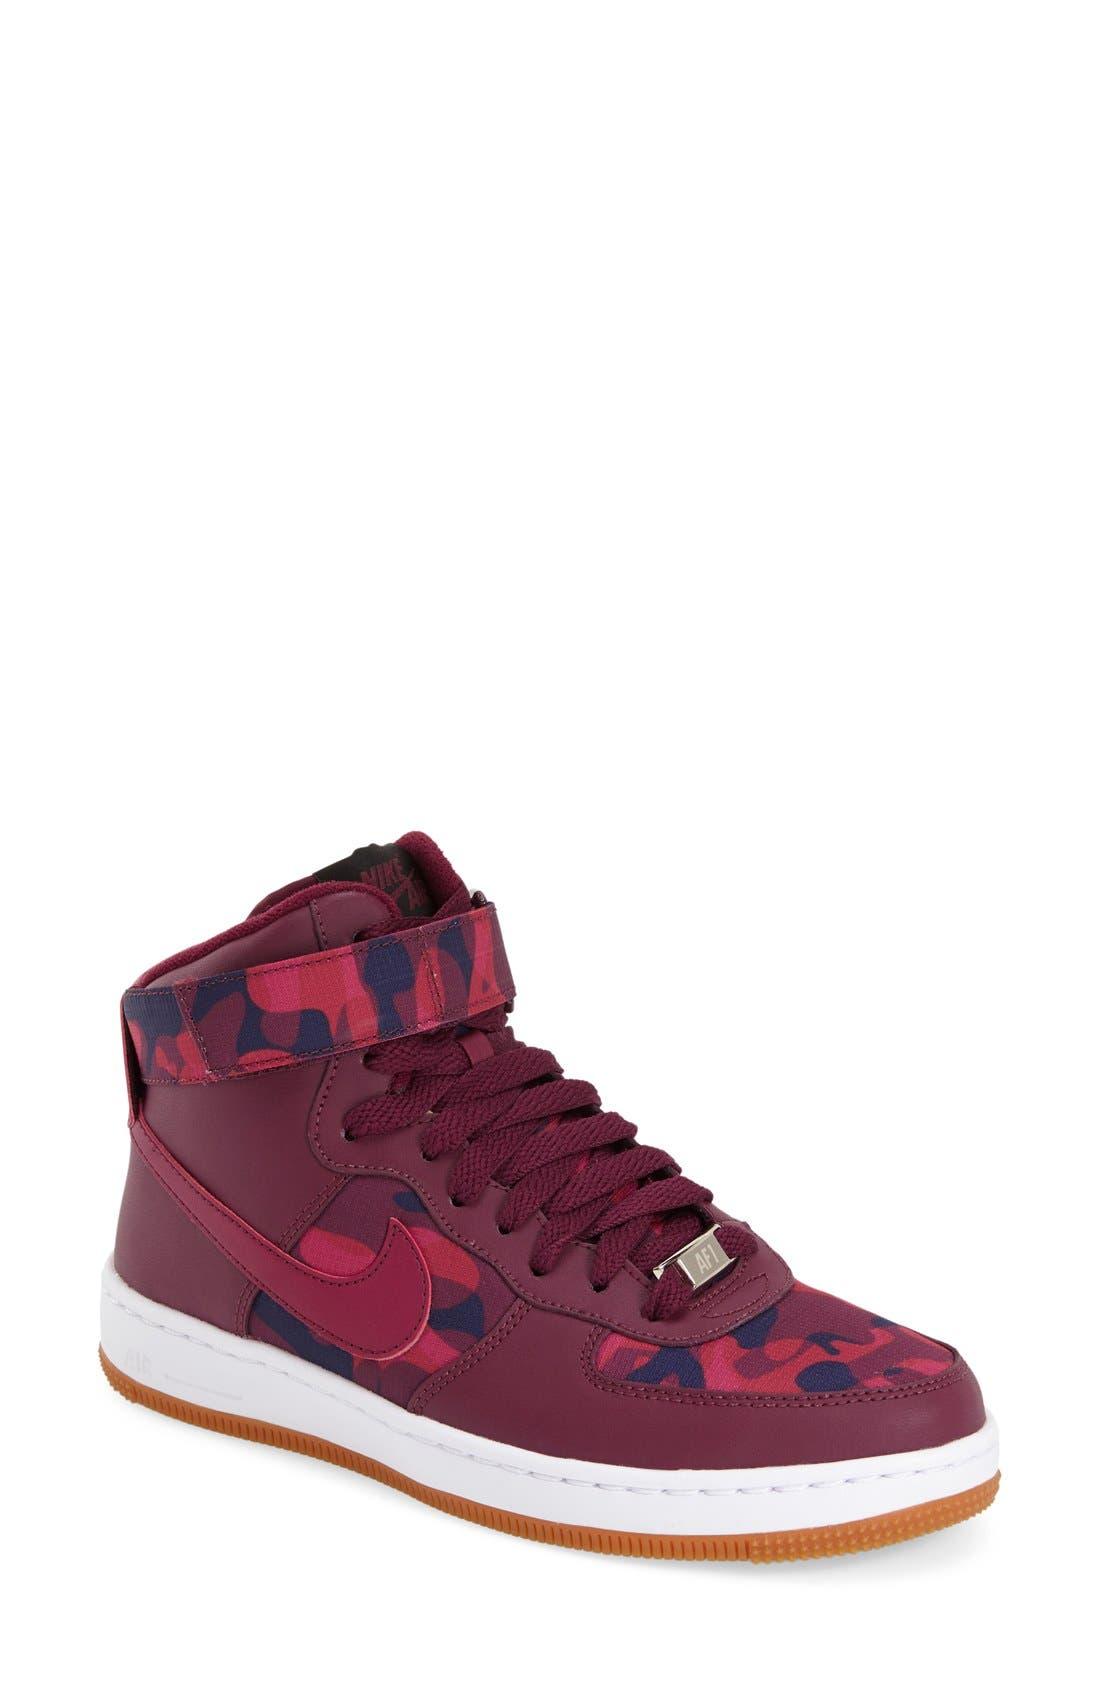 Main Image - Nike 'AF-1 Ultra Force' Sneaker (Women)